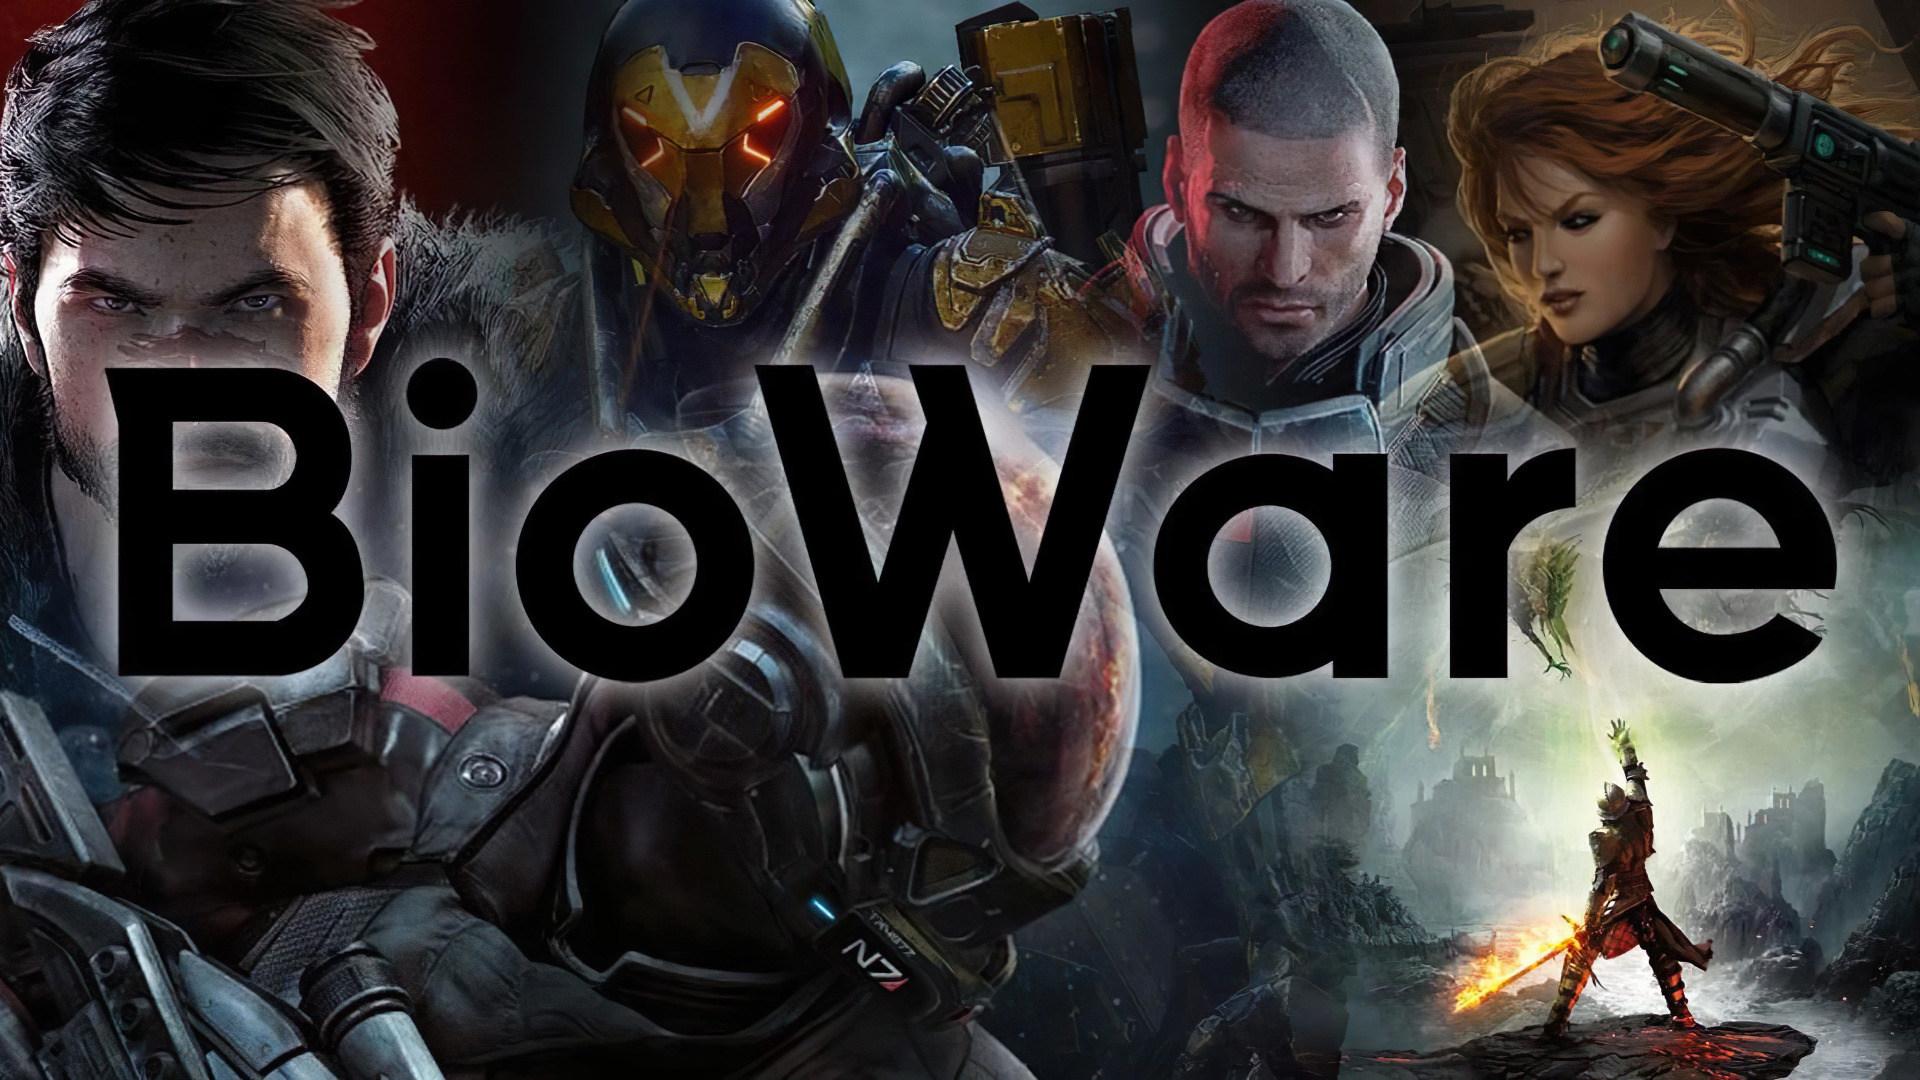 Electronic Arts, Ea, BioWare, Mass Effect, Dragon Age